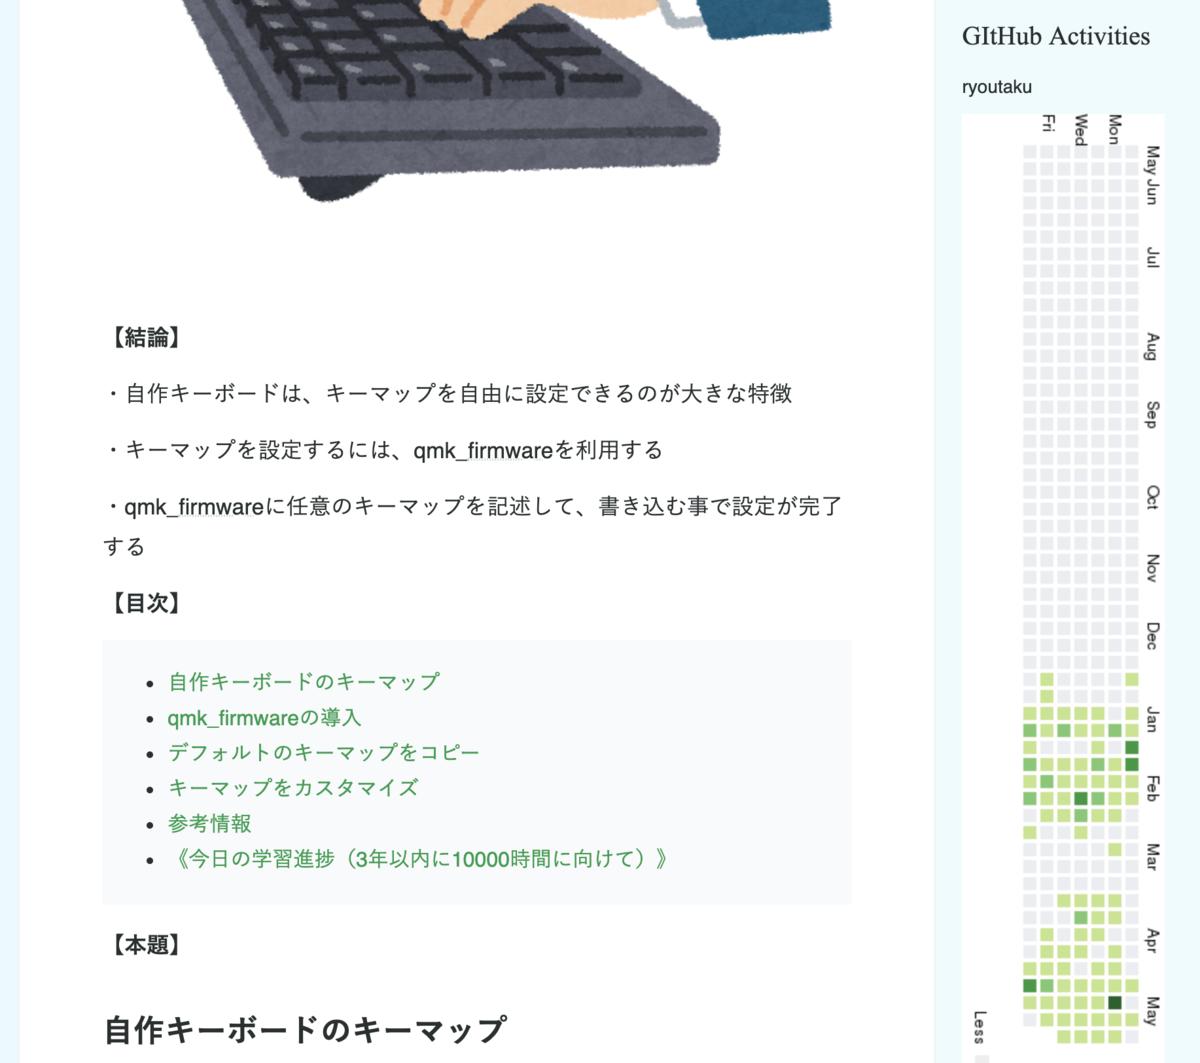 f:id:ryoutaku_jo:20190523224815p:plain